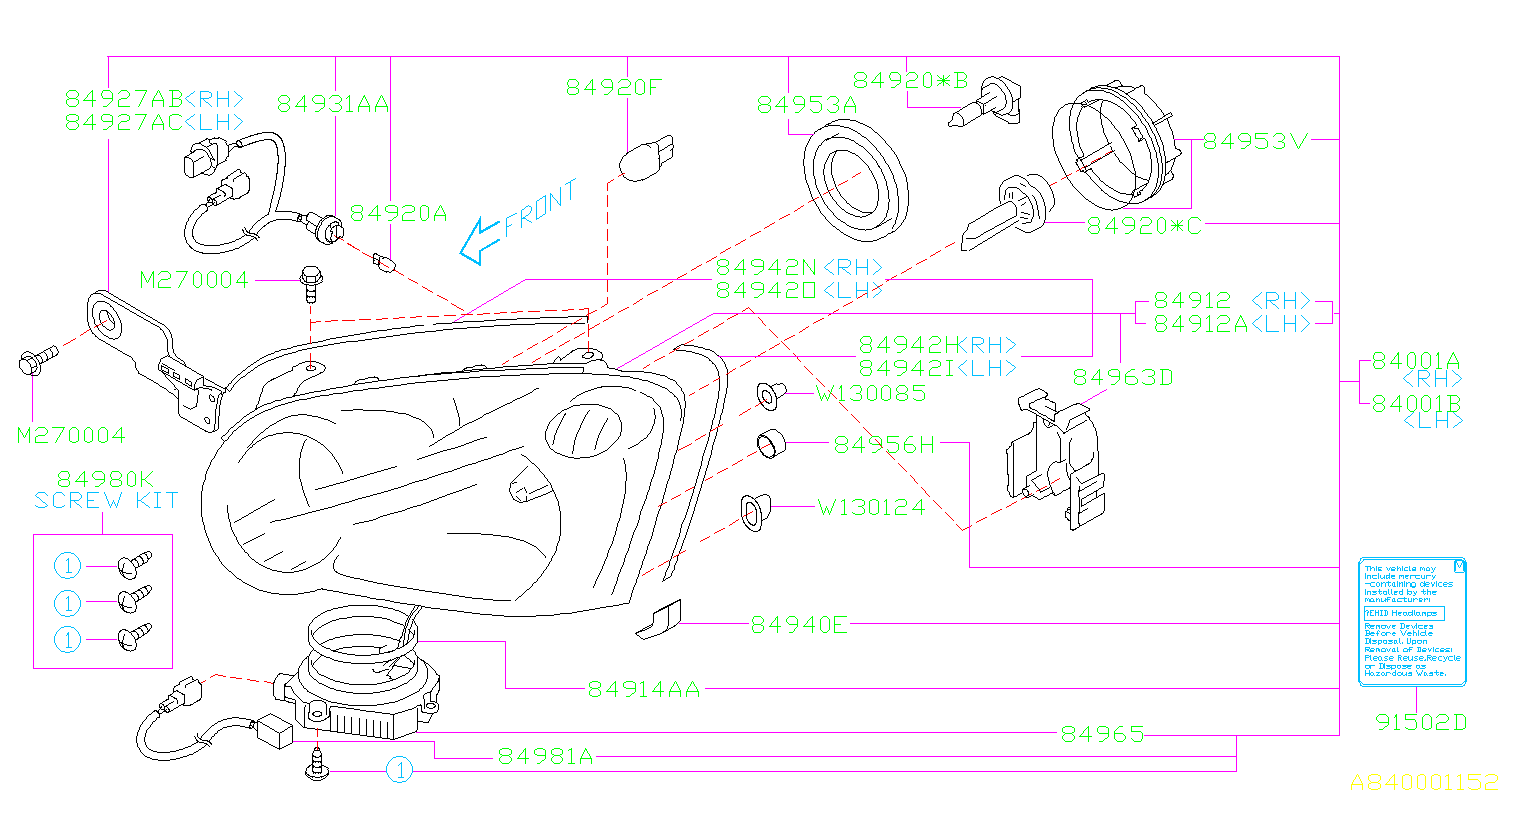 Subaru Impreza Headlight Wiring Harness